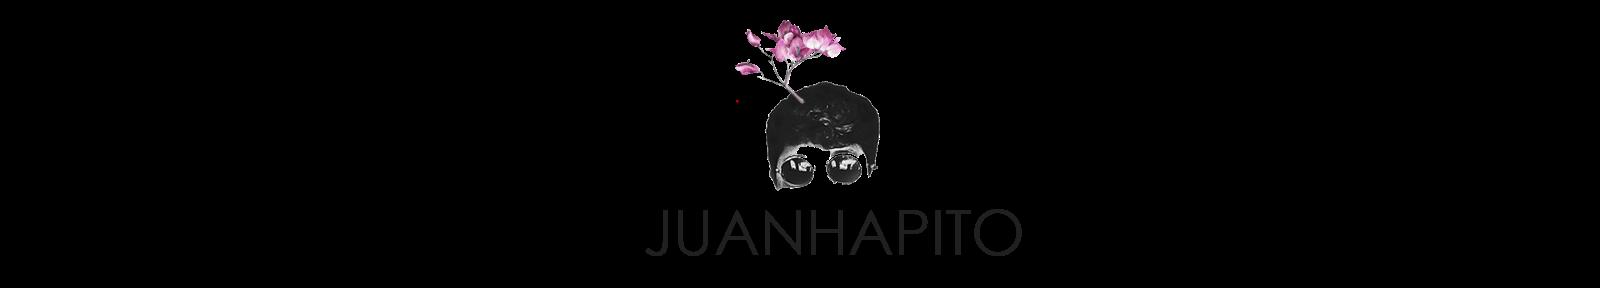 JUANHAPITO